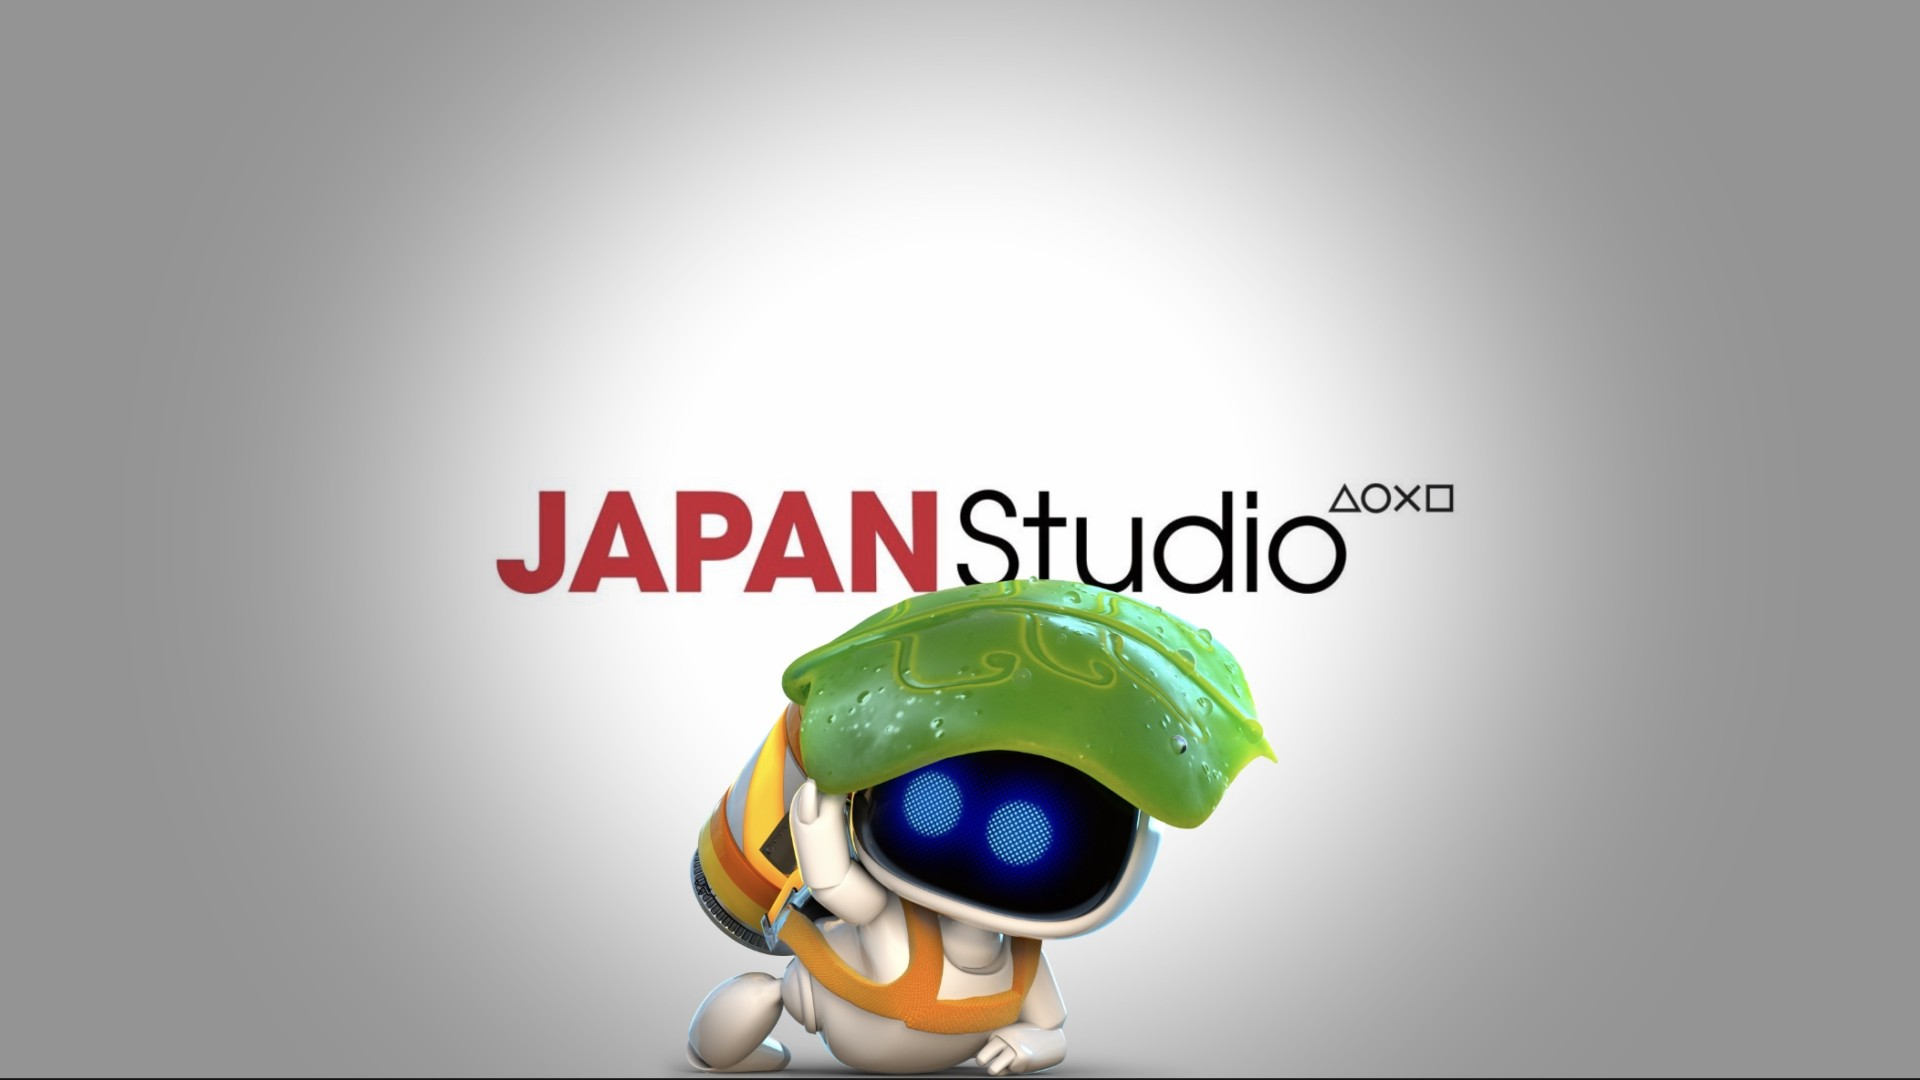 سوني استوديو Japan Studio